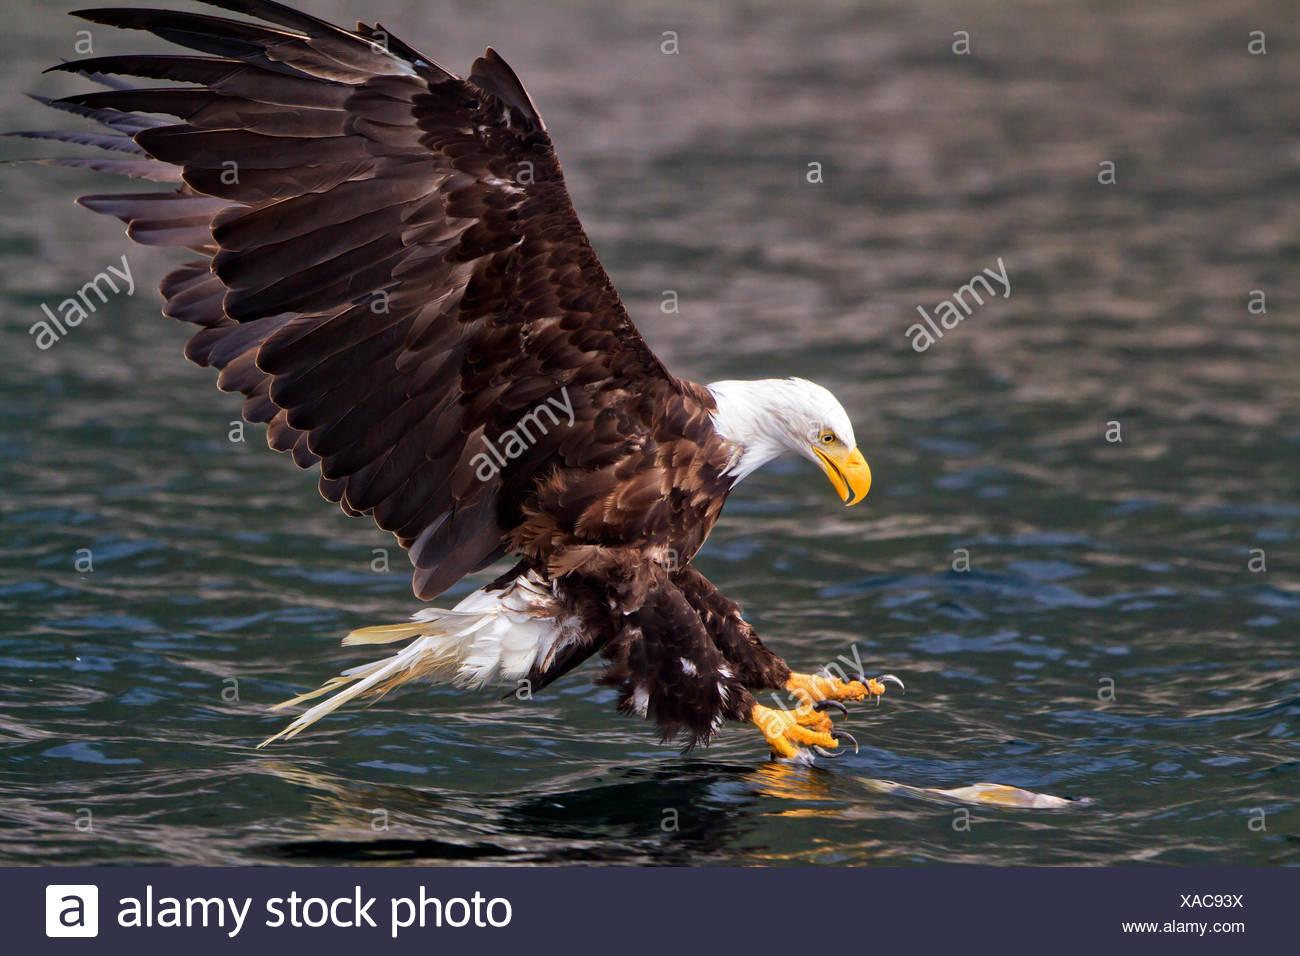 Bald eagle just before catching a fish in Broughton Archipelago Provincial Park, British Columbia, Canada. haliaeetus leucocephalus - Stock Image